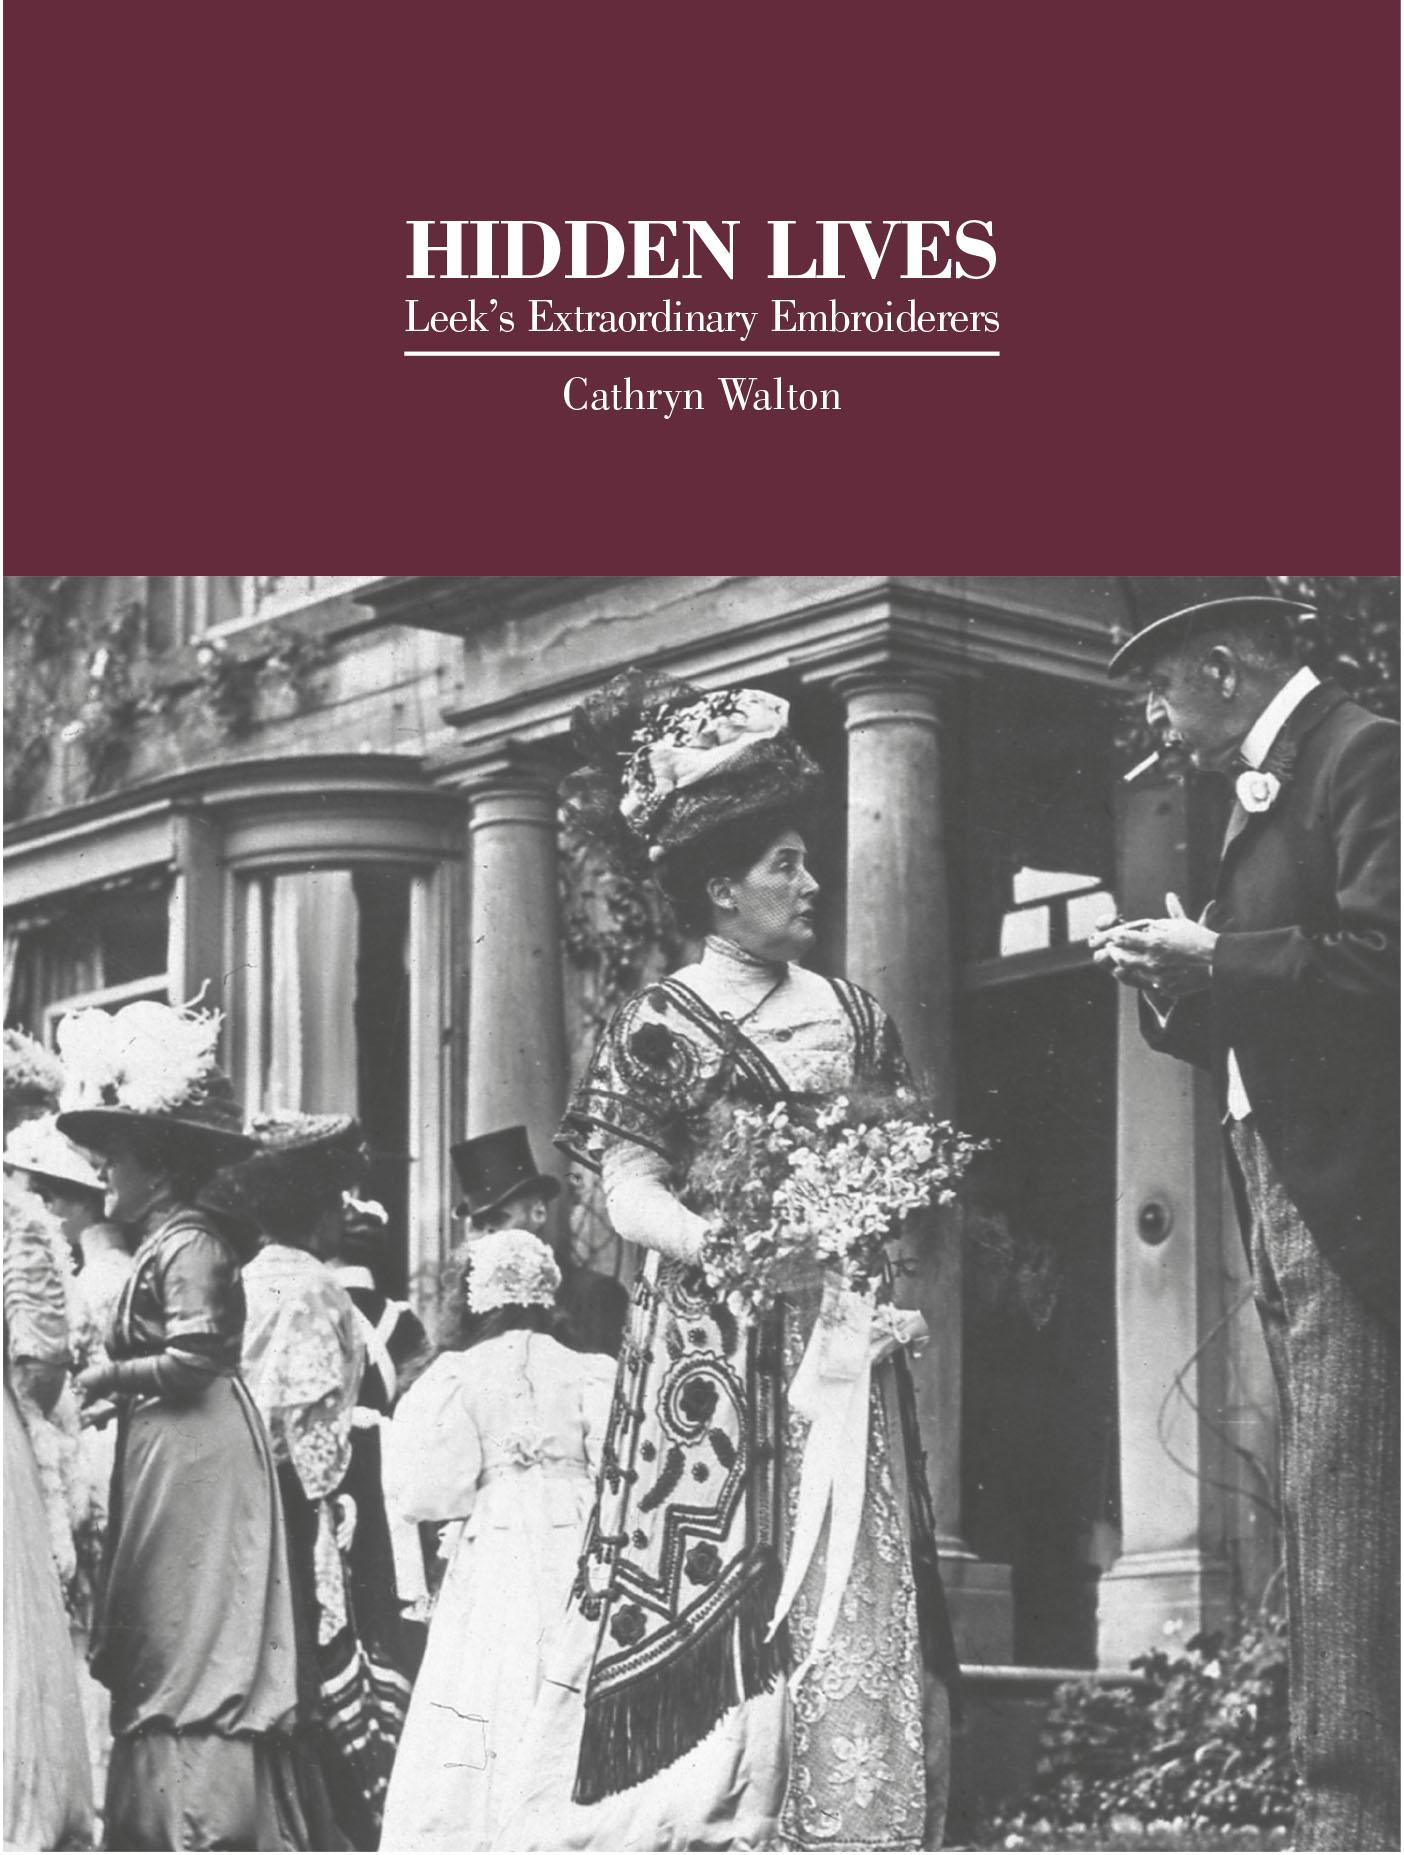 HIDDEN LIVES -FRONT COVER